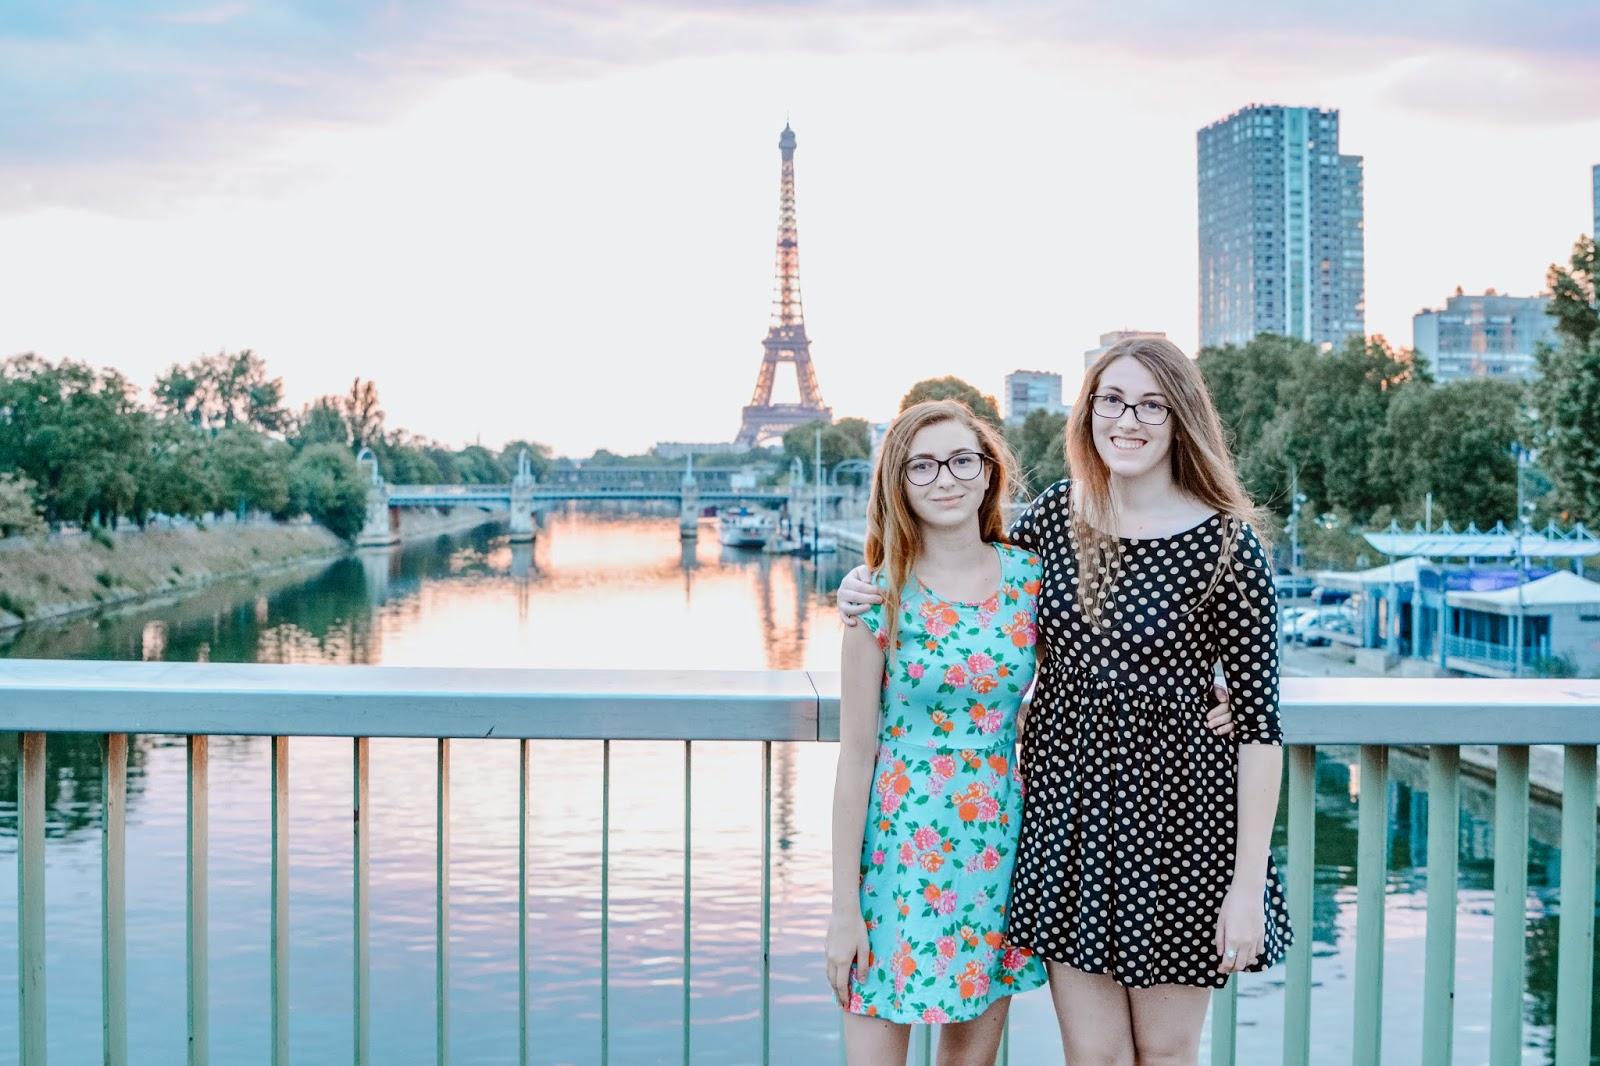 Paris Eiffel Towler